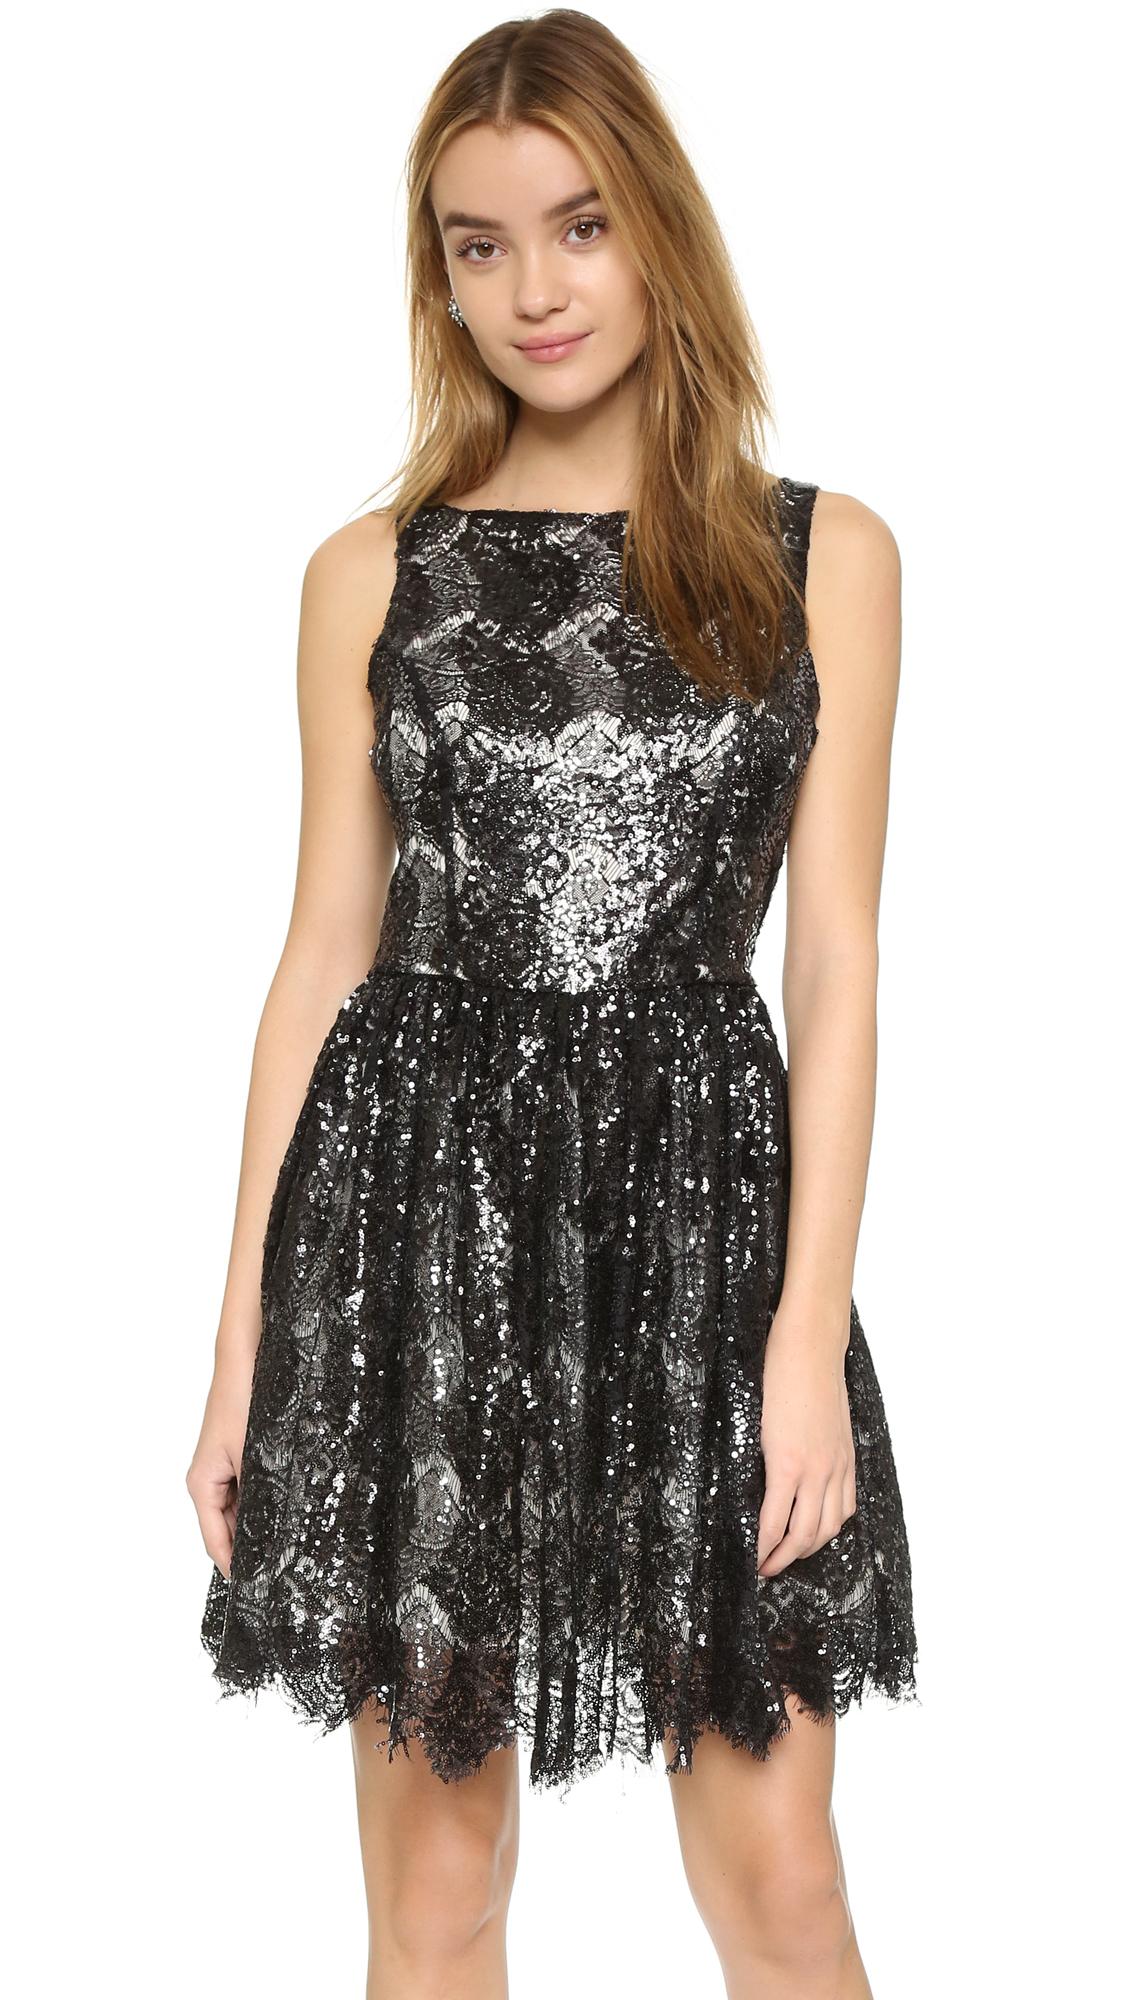 Bb dakota Sabrina Sequin Lace Dress in Black